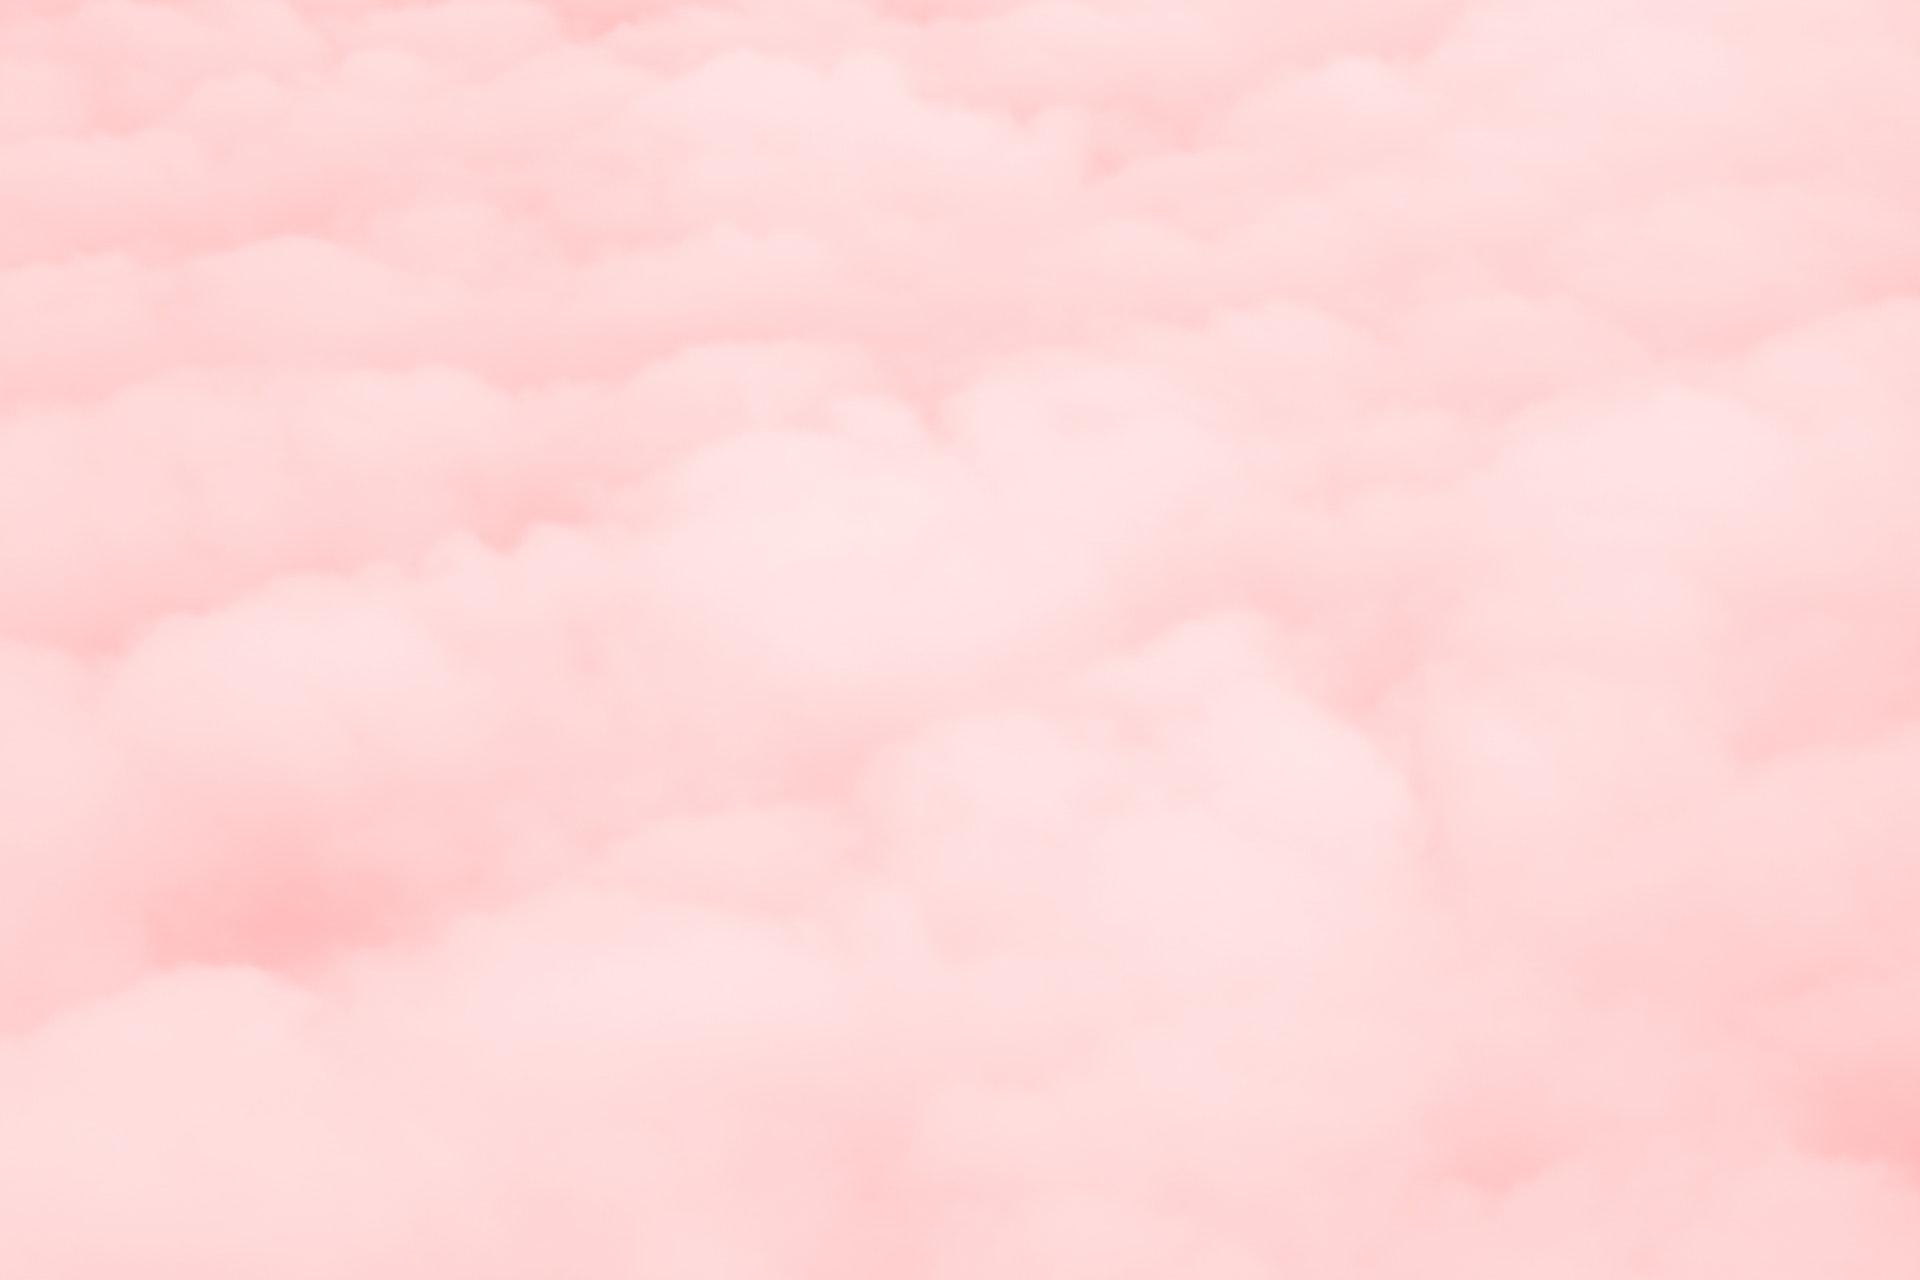 pink-clouds-1831234